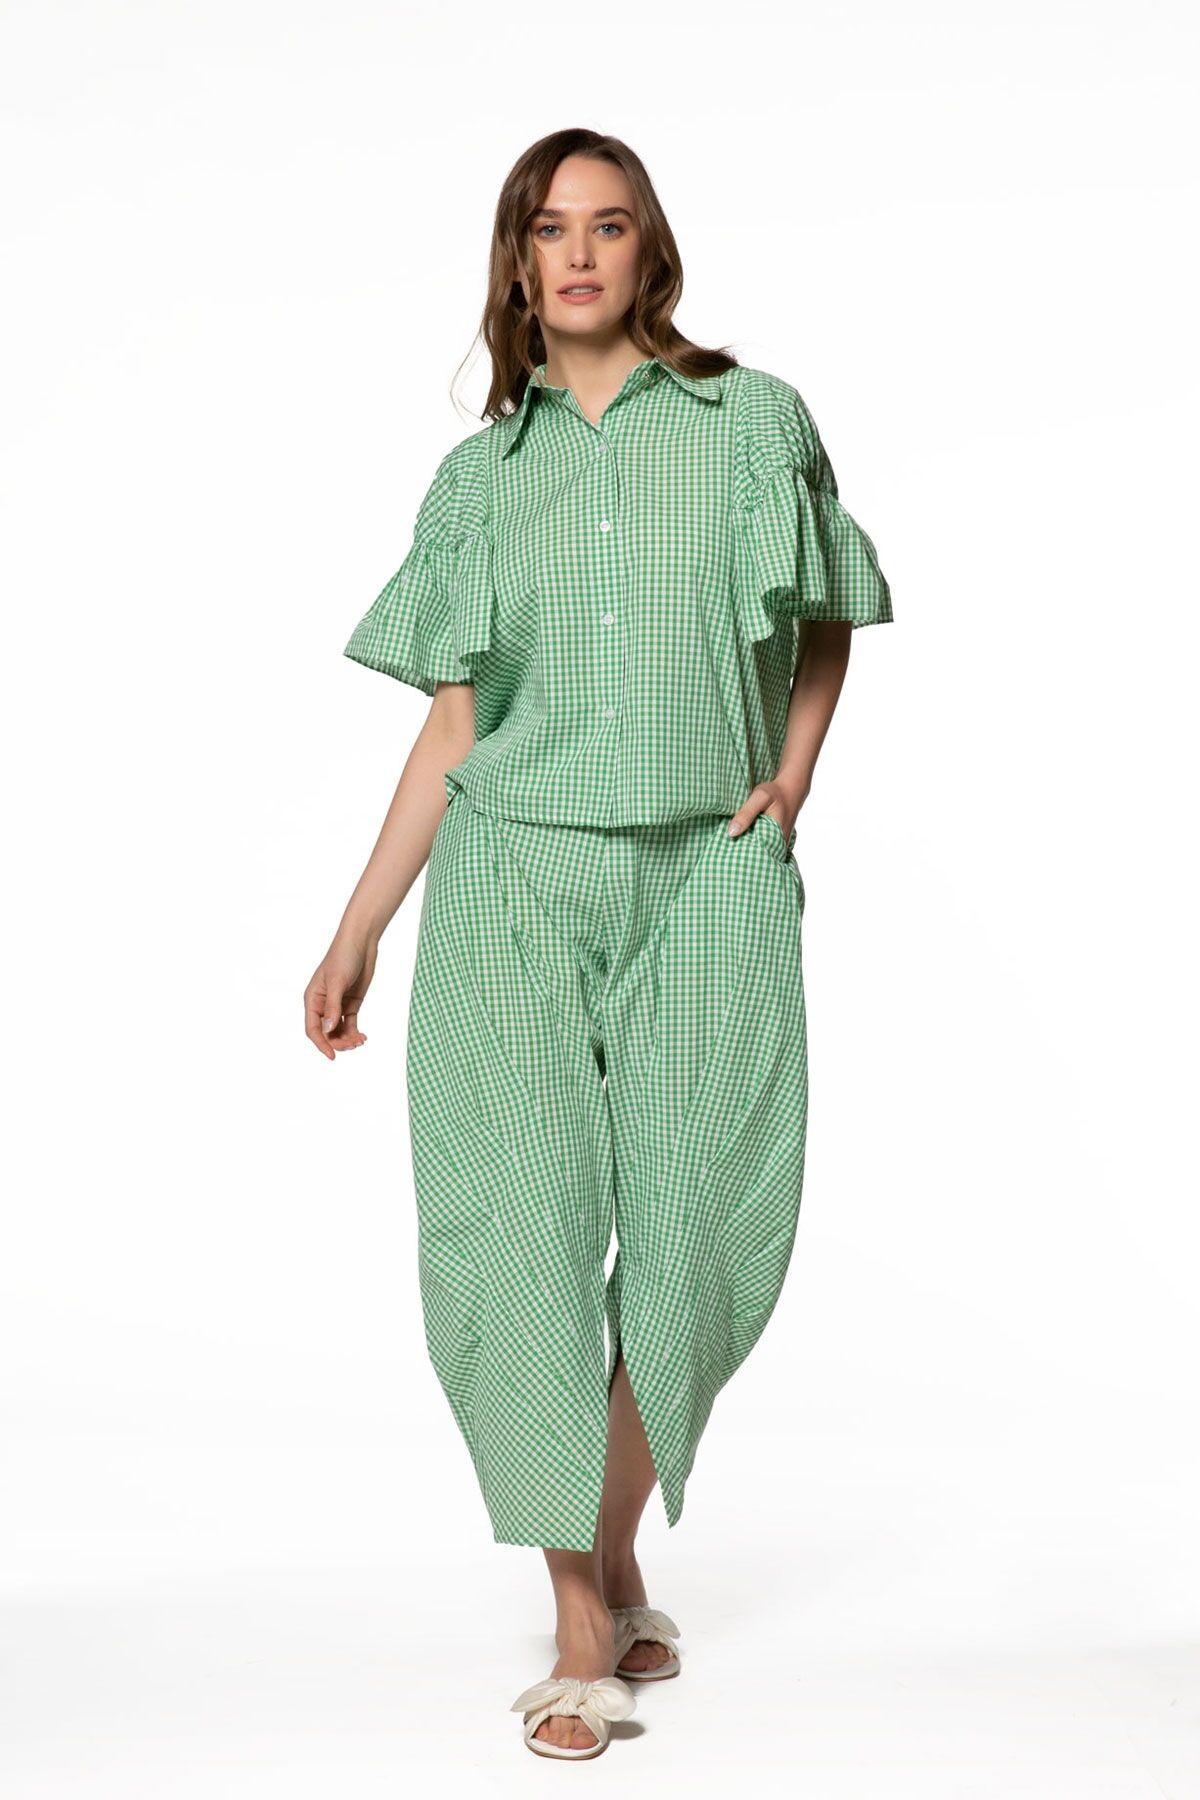 Fırfır Detaylı Yeşil Gömlek